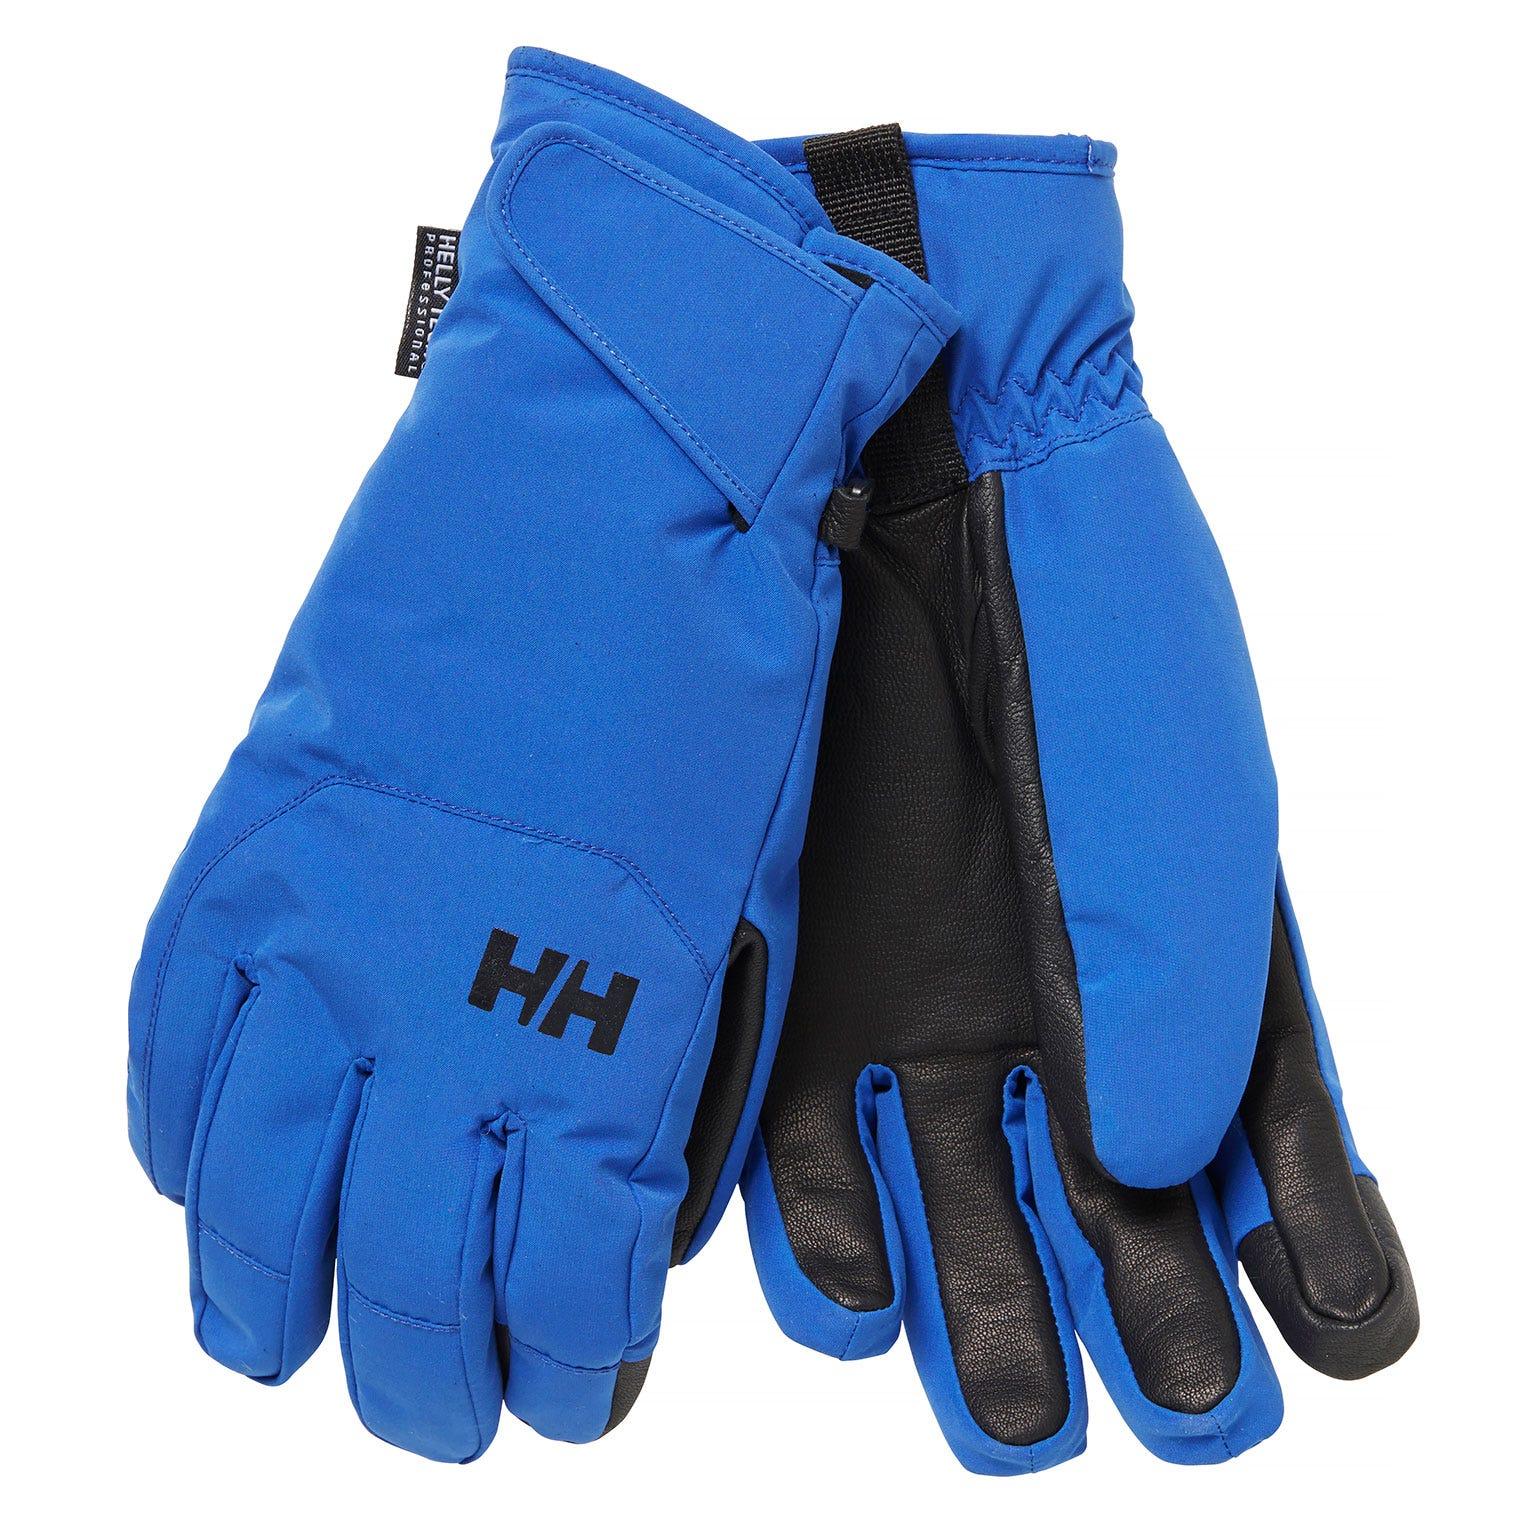 Helly Hansen Swift Ht Glove Mens Blue XL